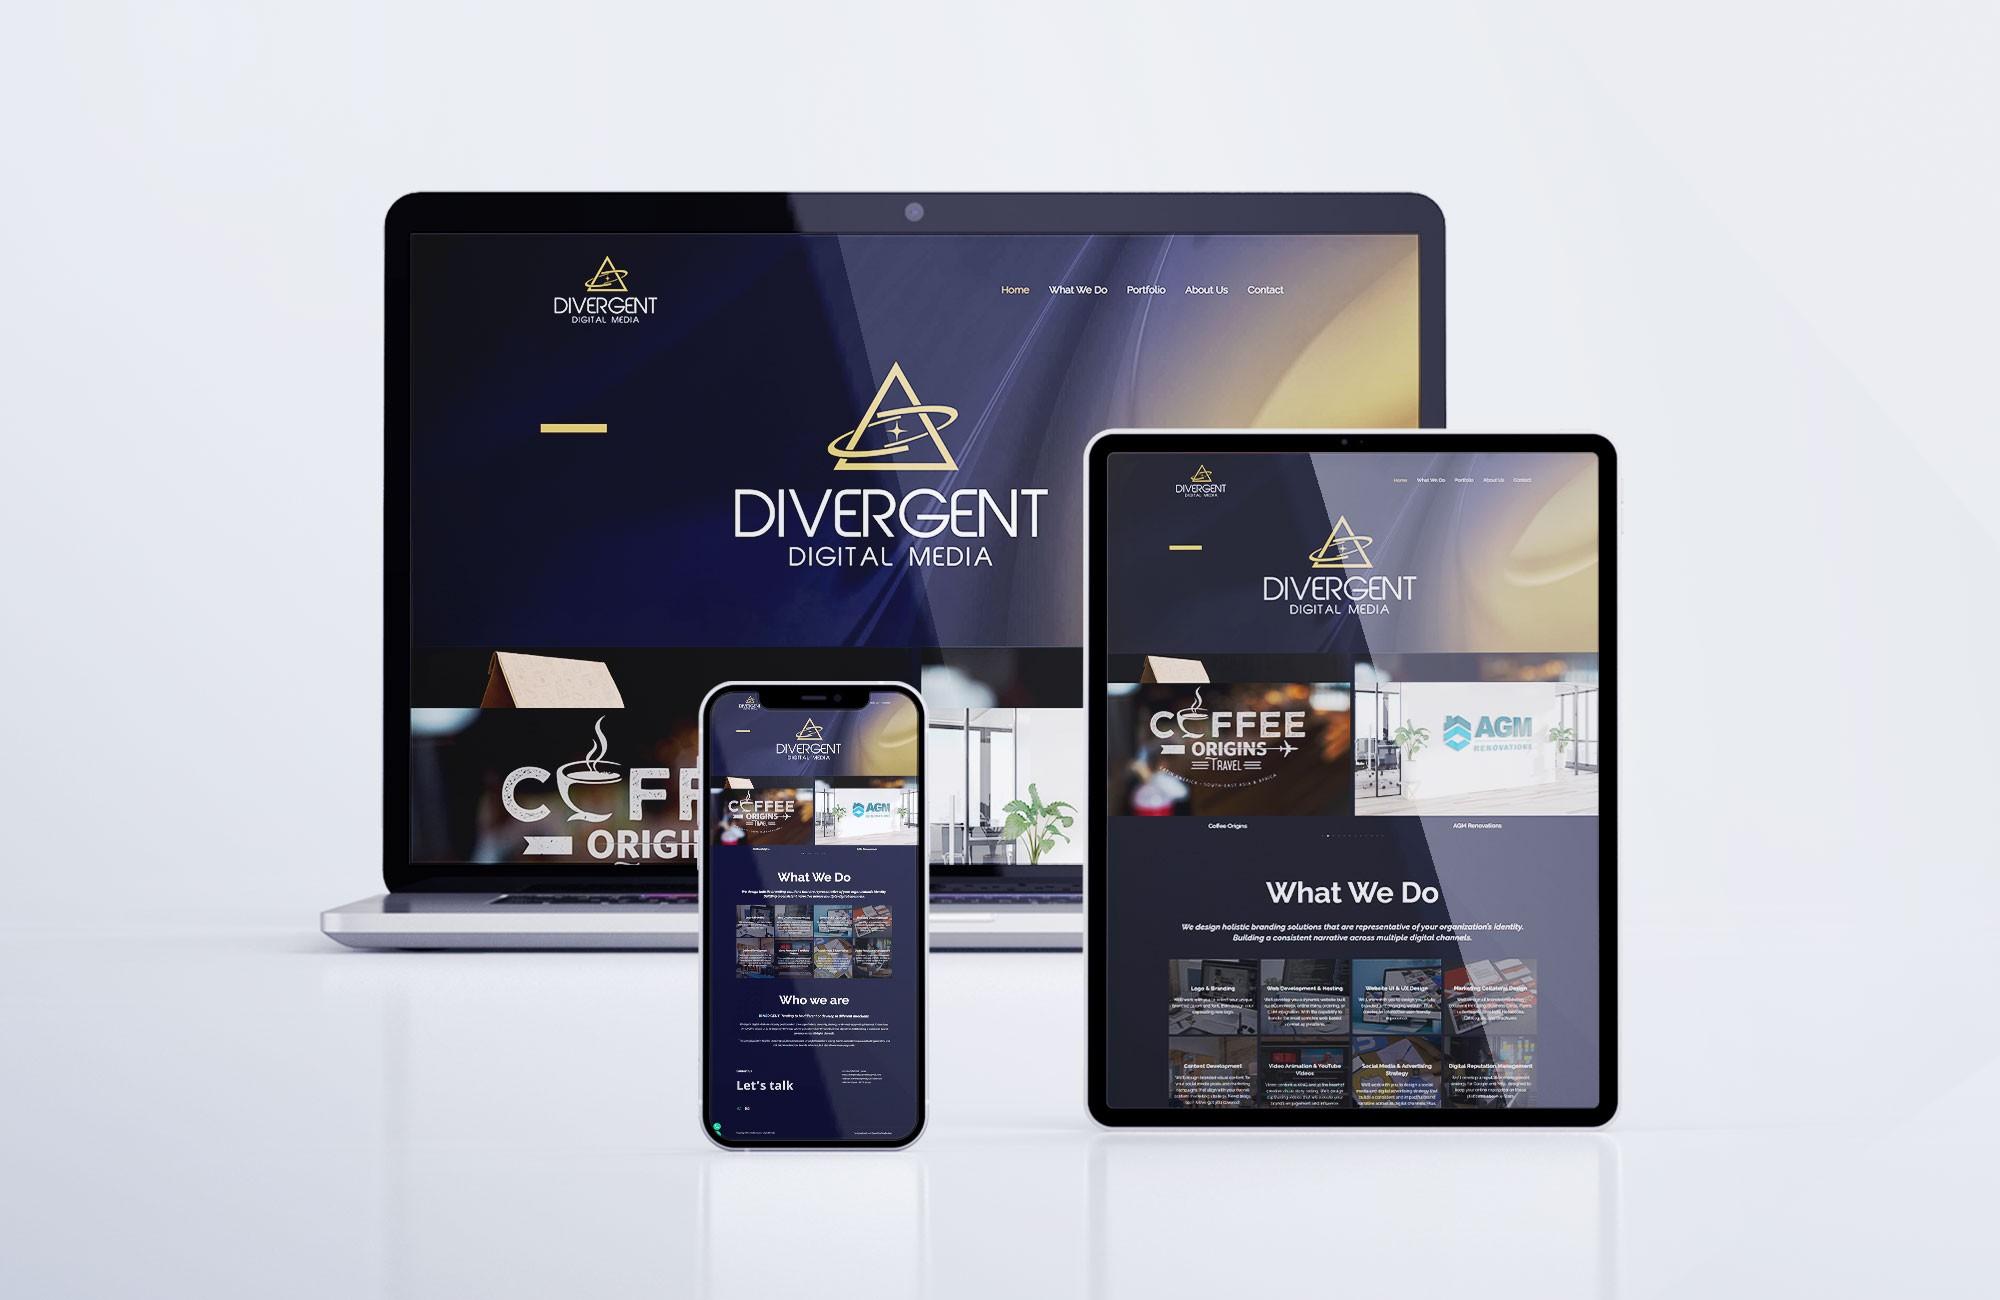 Divergent Digital Media